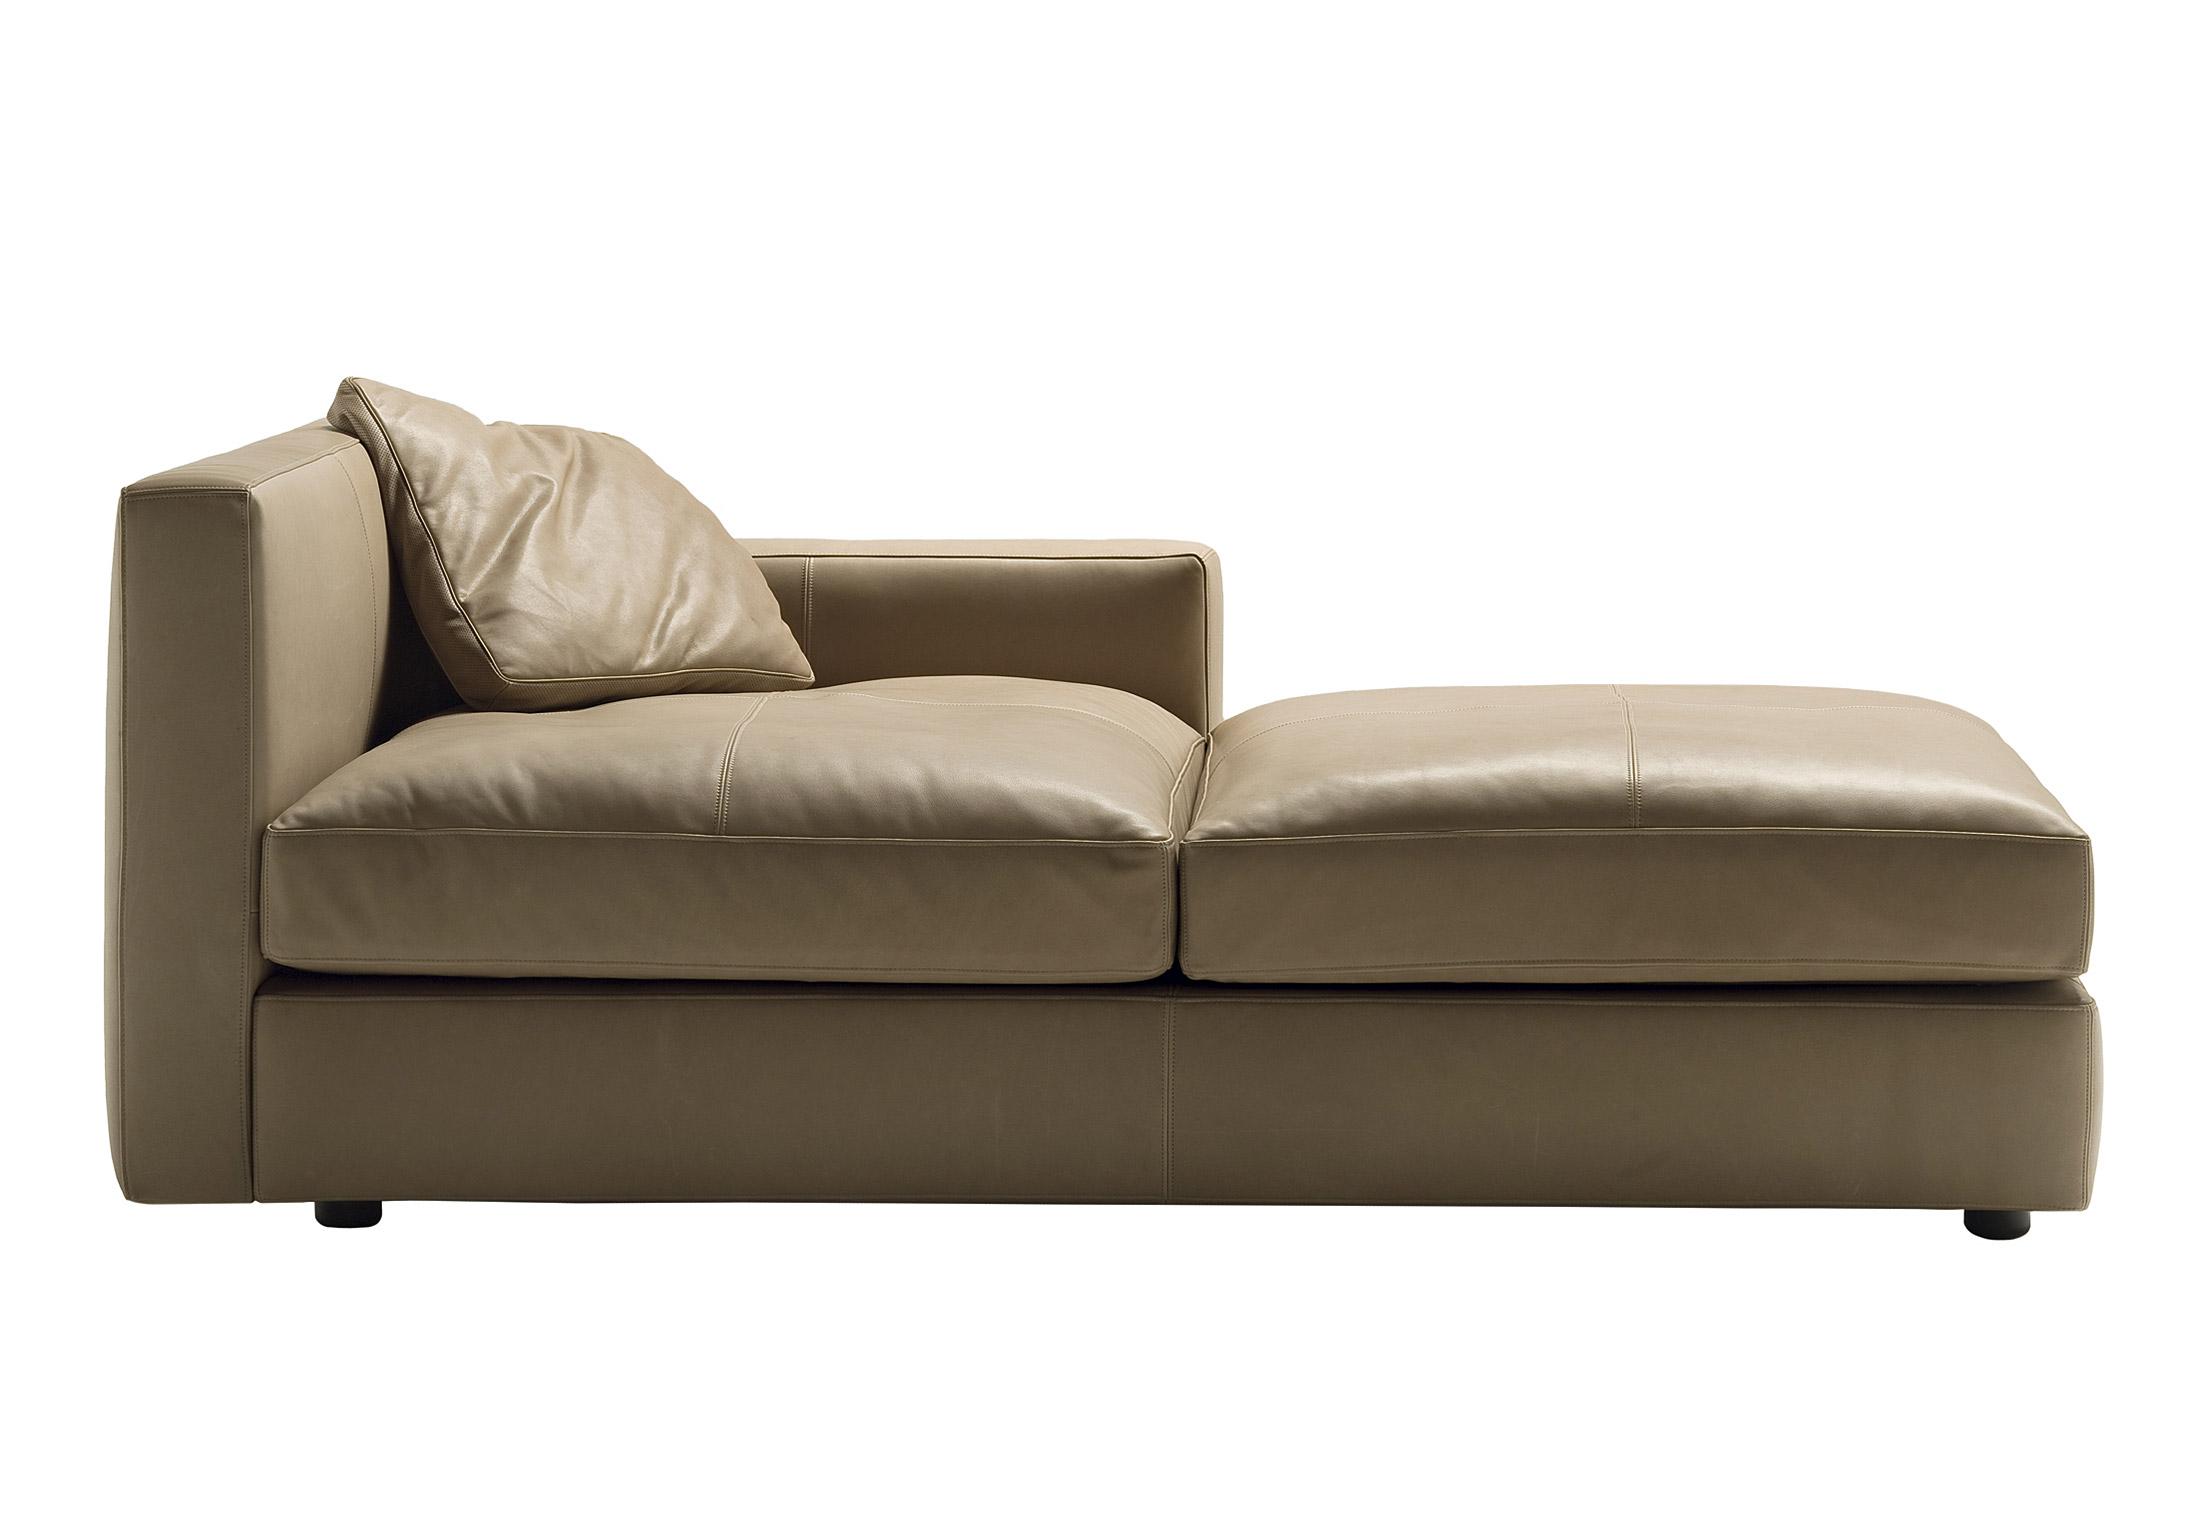 massimosistema ottomane von poltrona frau stylepark. Black Bedroom Furniture Sets. Home Design Ideas